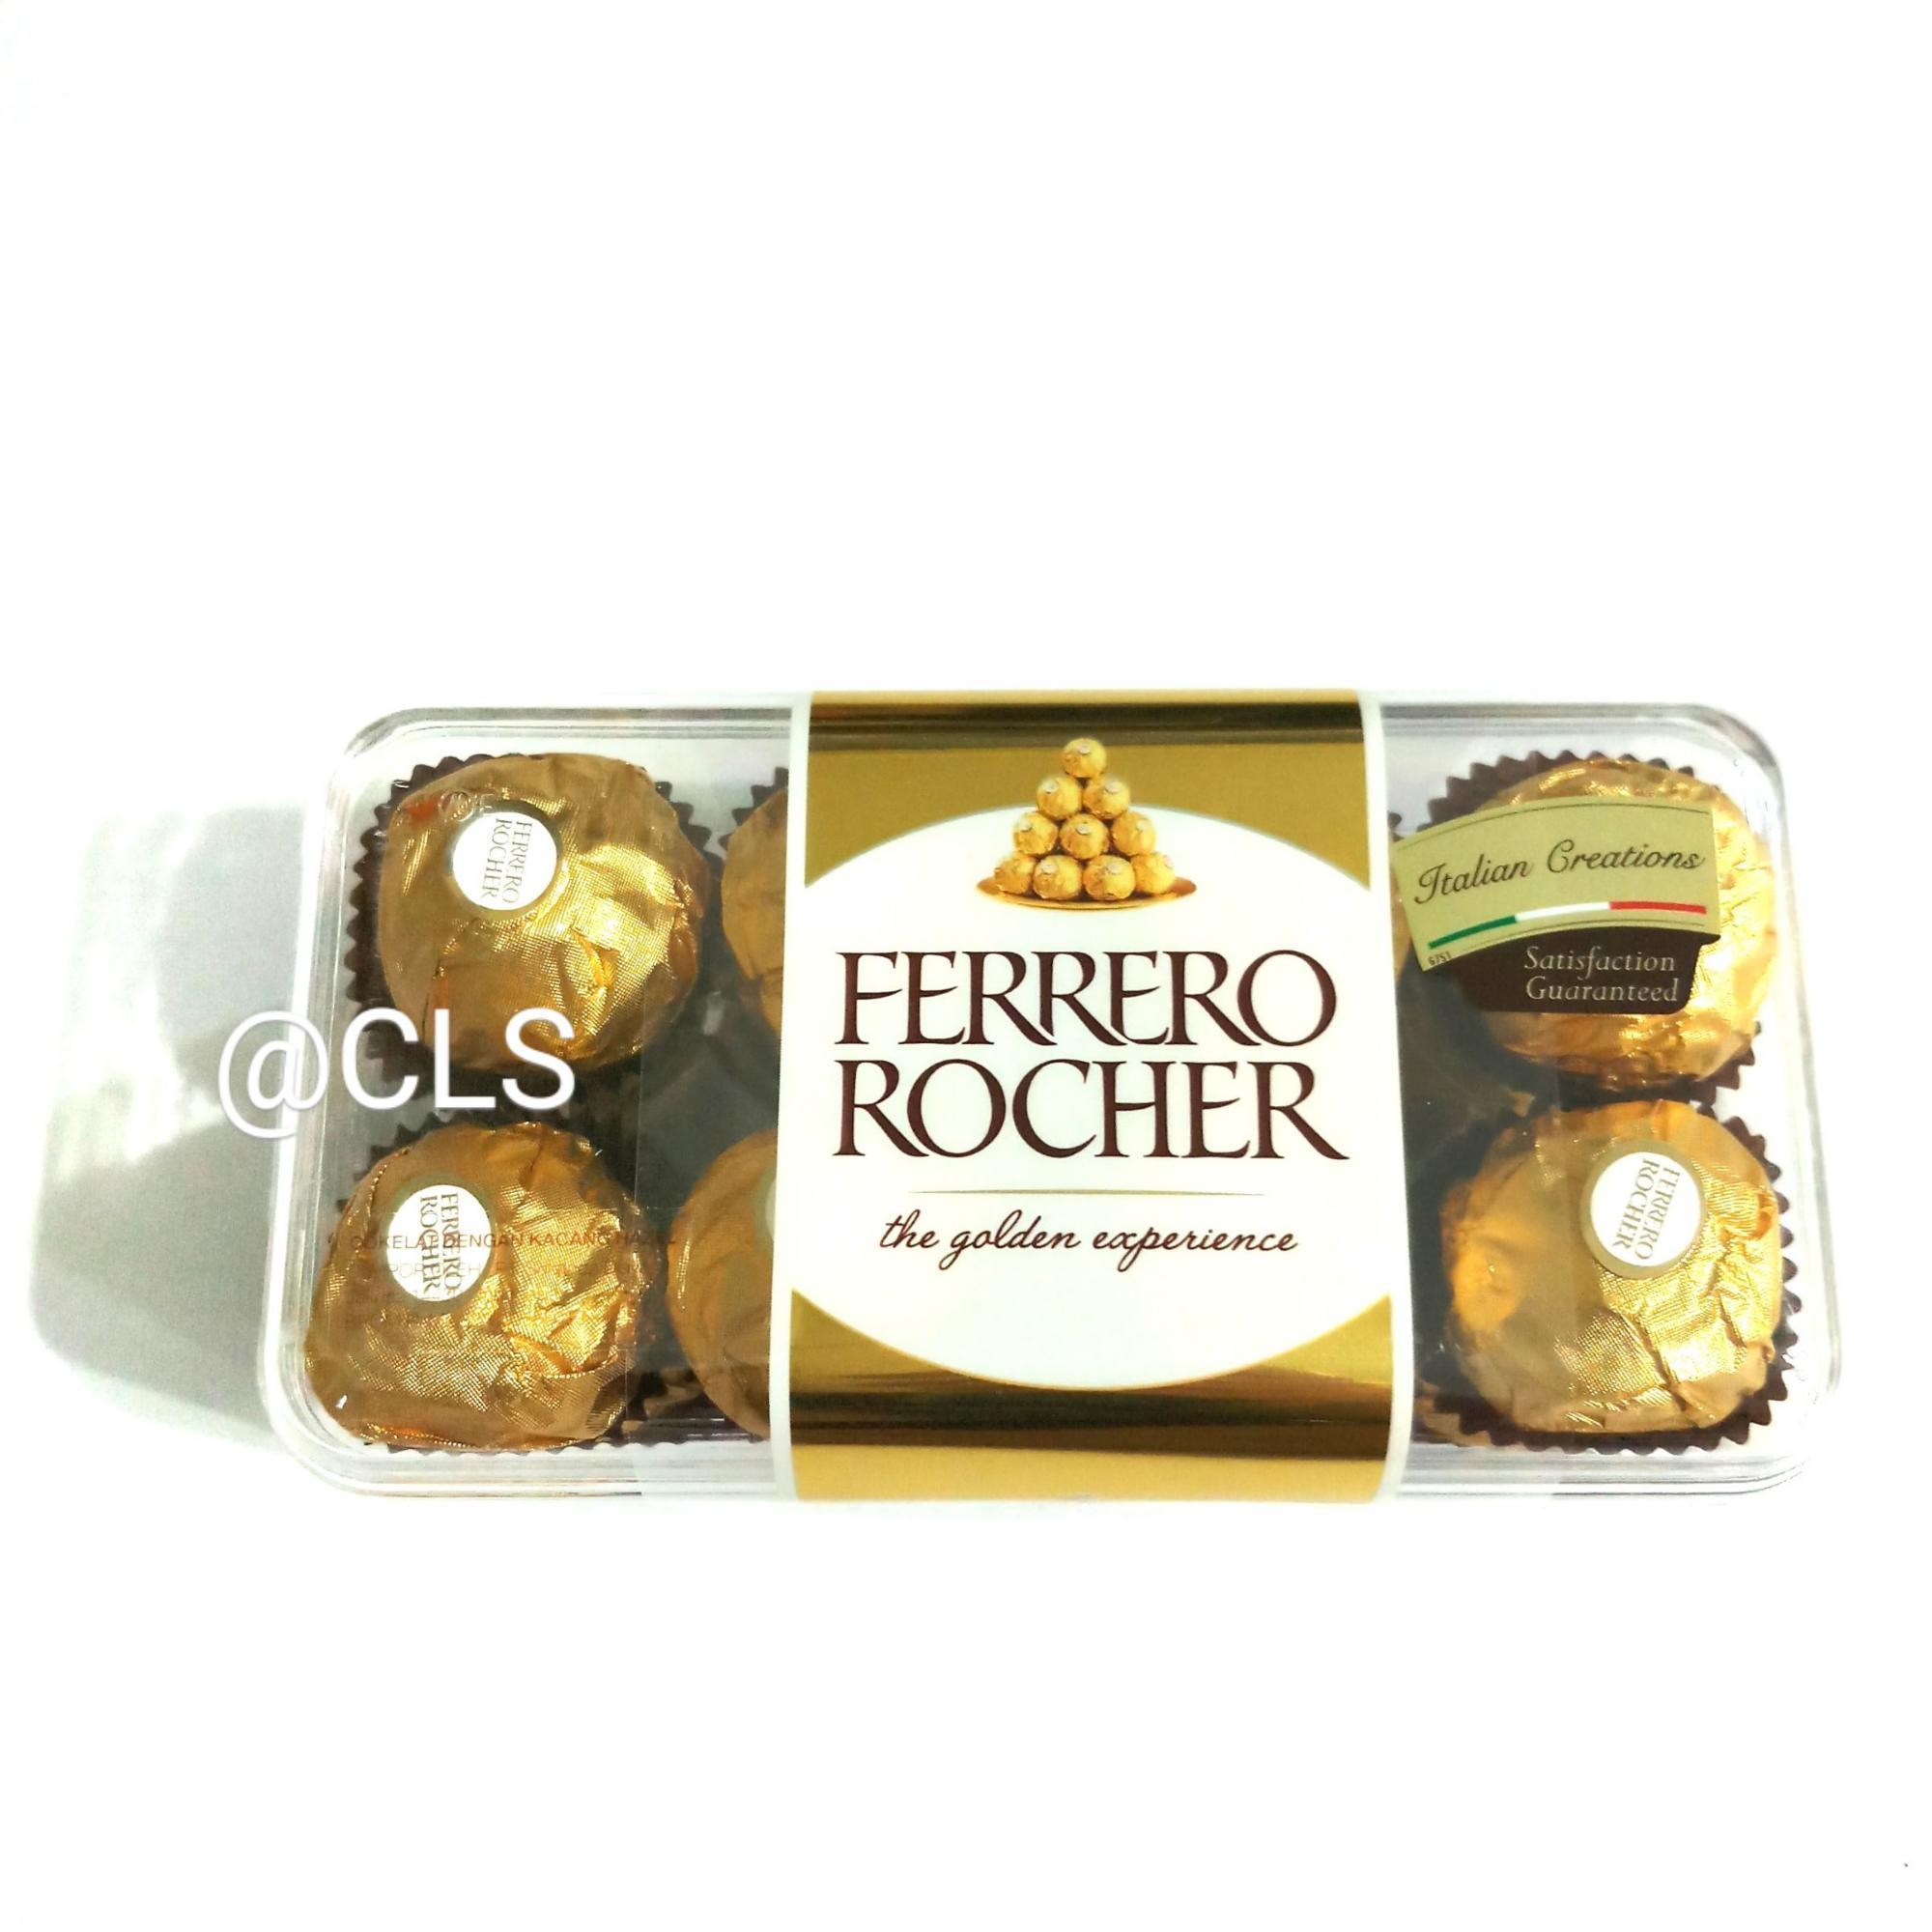 Buy Sell Cheapest Coklat Ferrero Rocher Best Quality Product Deals T24 24pcs 200g